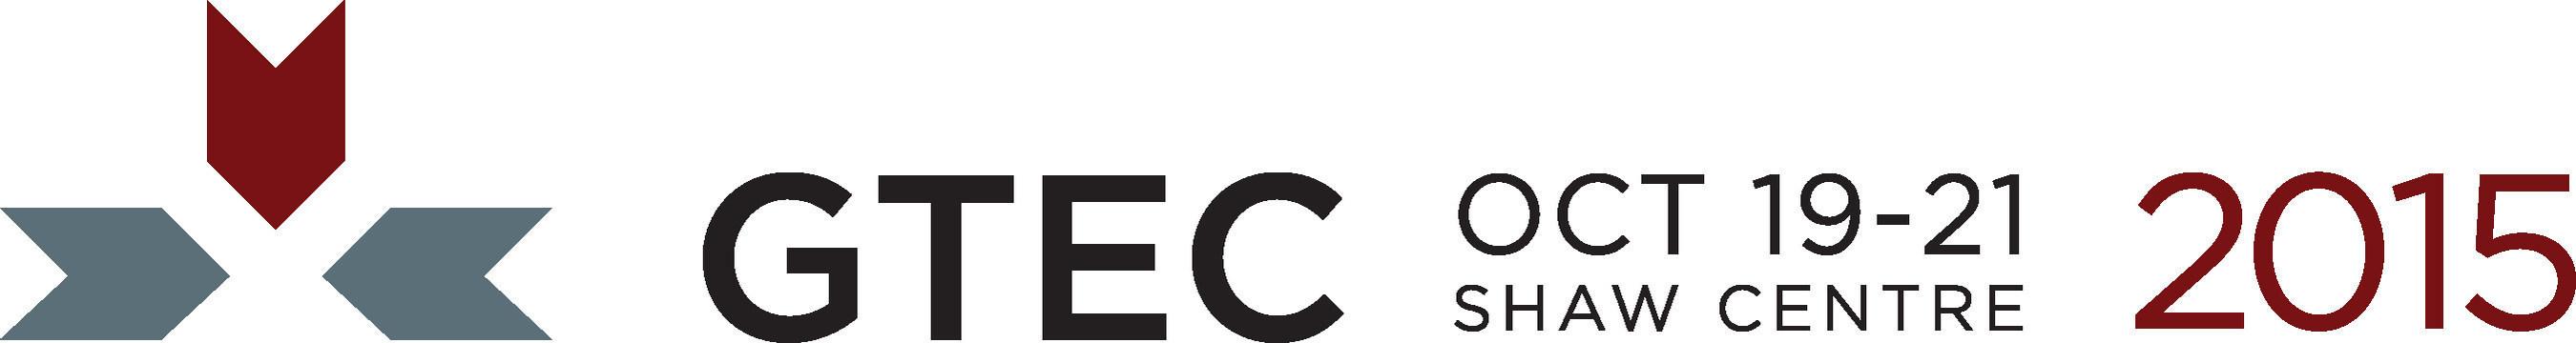 GTEC 2015 - October 19-21 - Shaw Centre, Ottawa